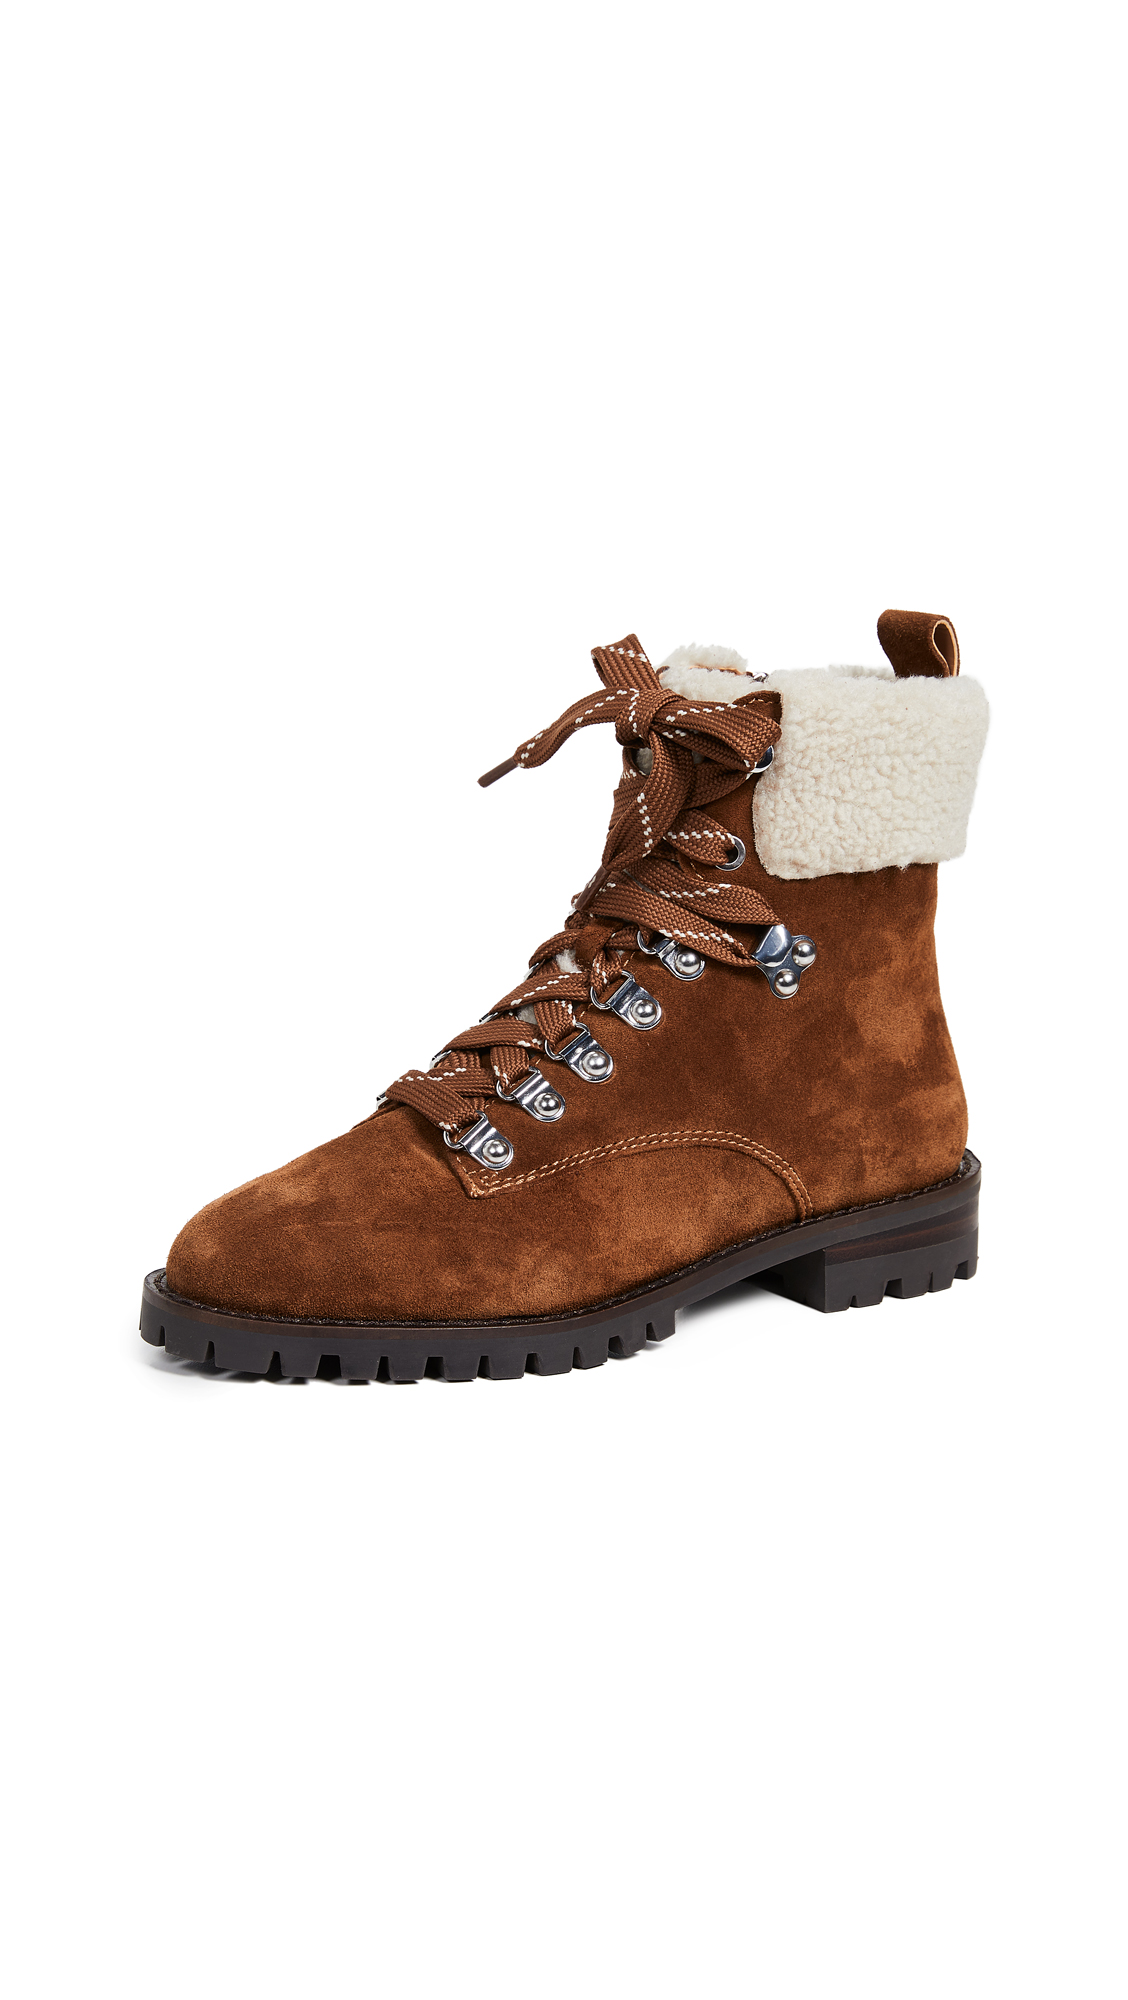 Rebecca Minkoff Jaylin Boots - Saddle